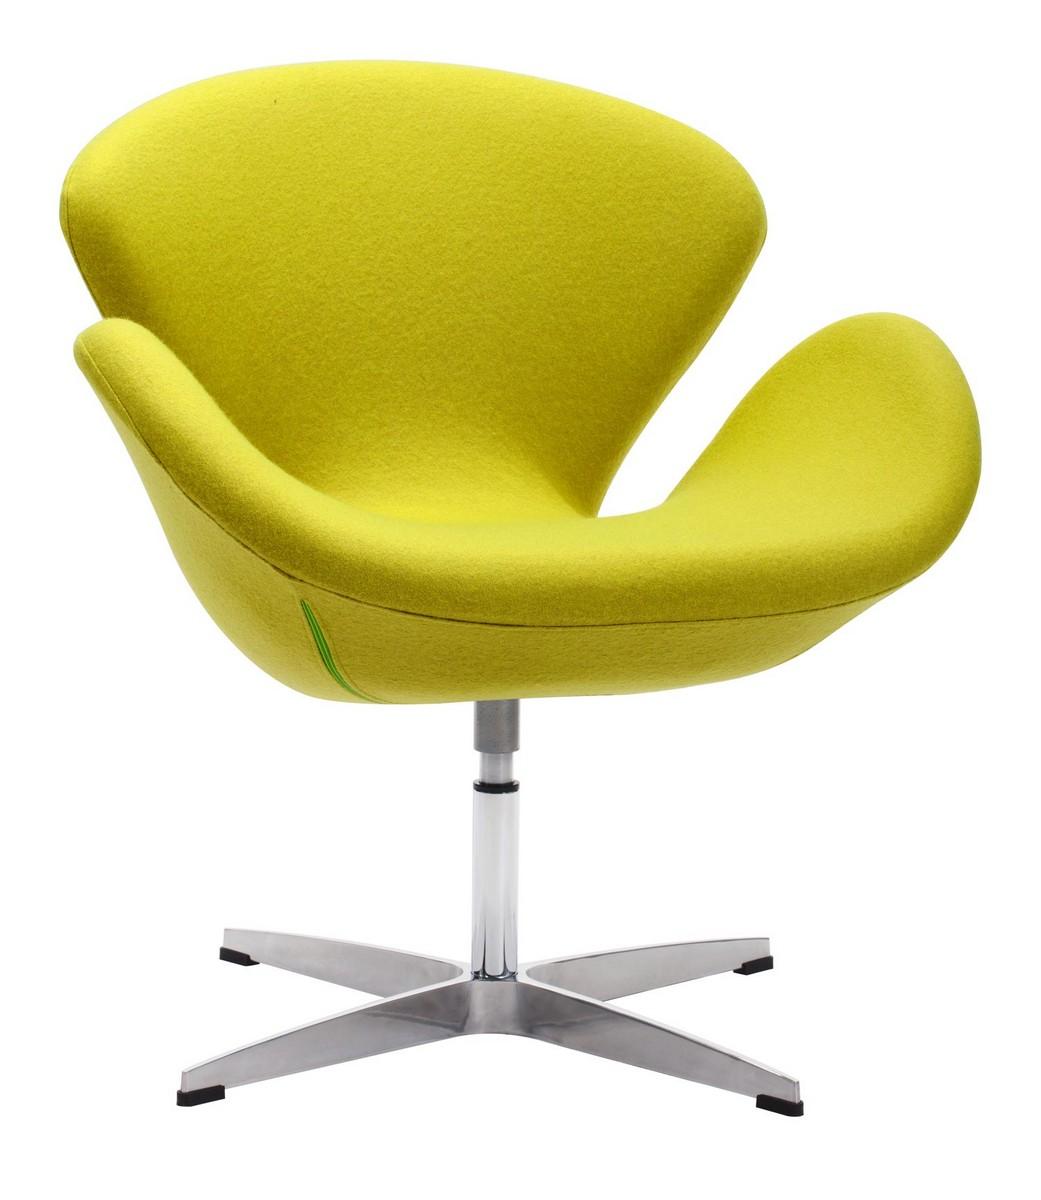 Zuo Modern Pori Occasional Chair - Pistachio Green